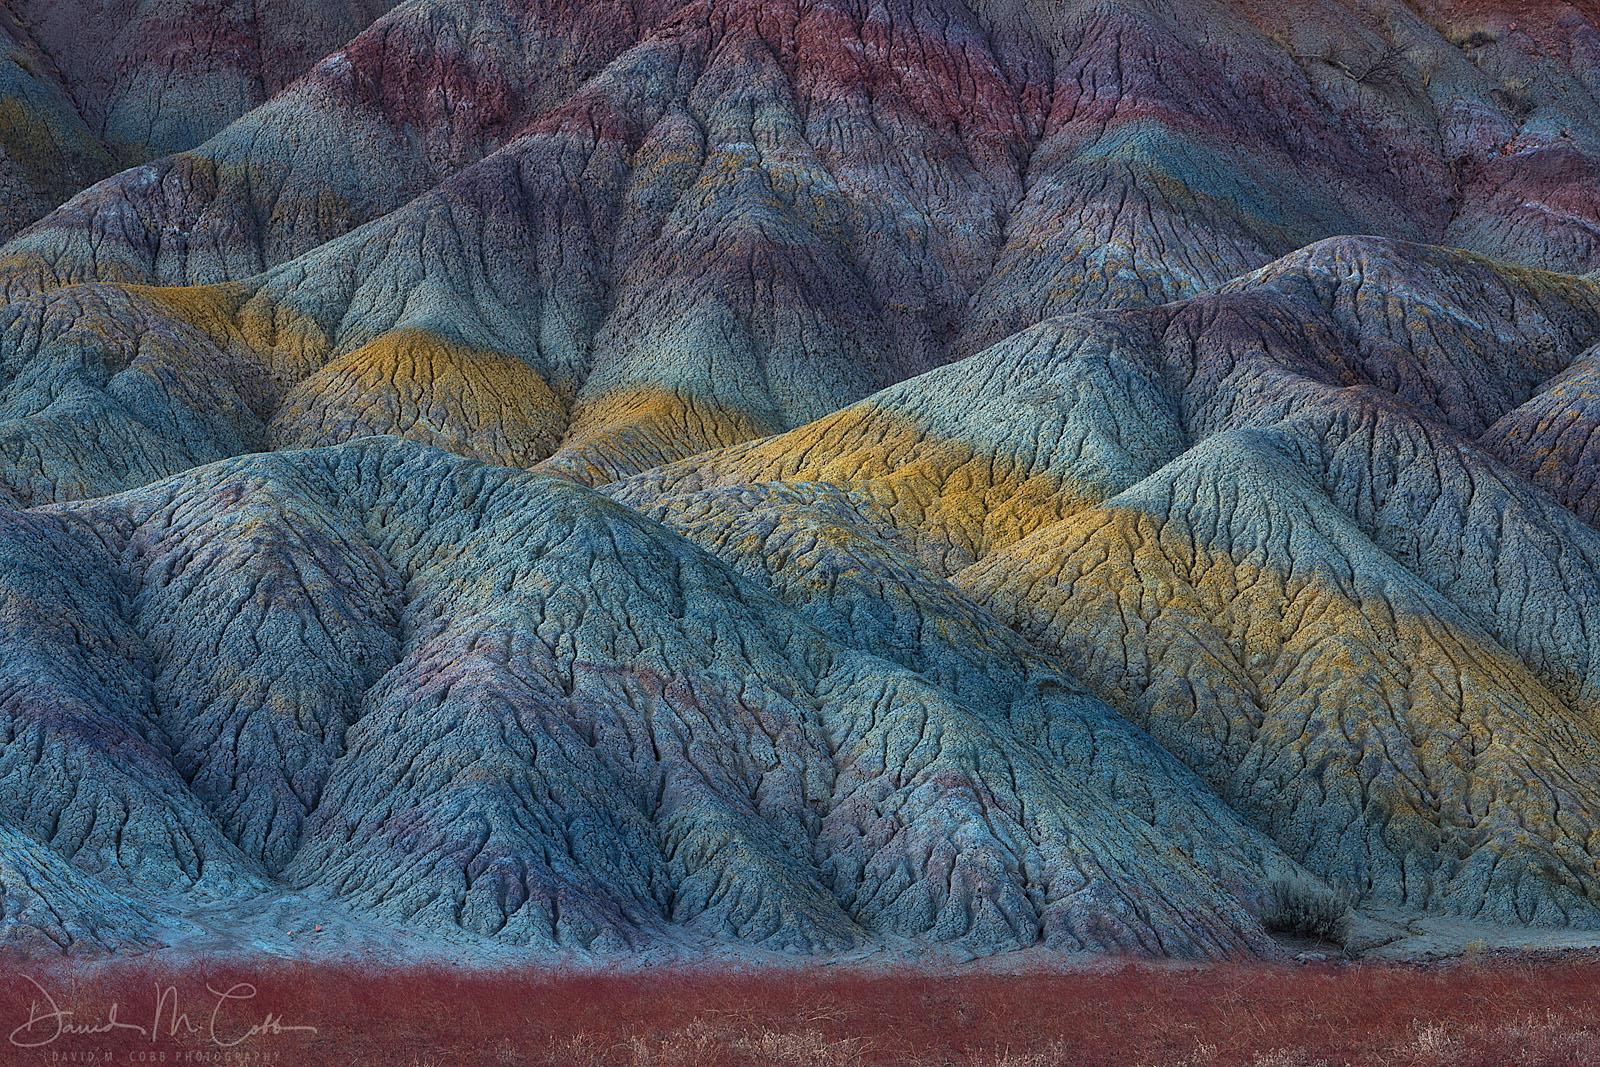 geology, geological, erosion, wind erosion, water erosion, colorful, soil, color, colors, strata, stratafication, photo